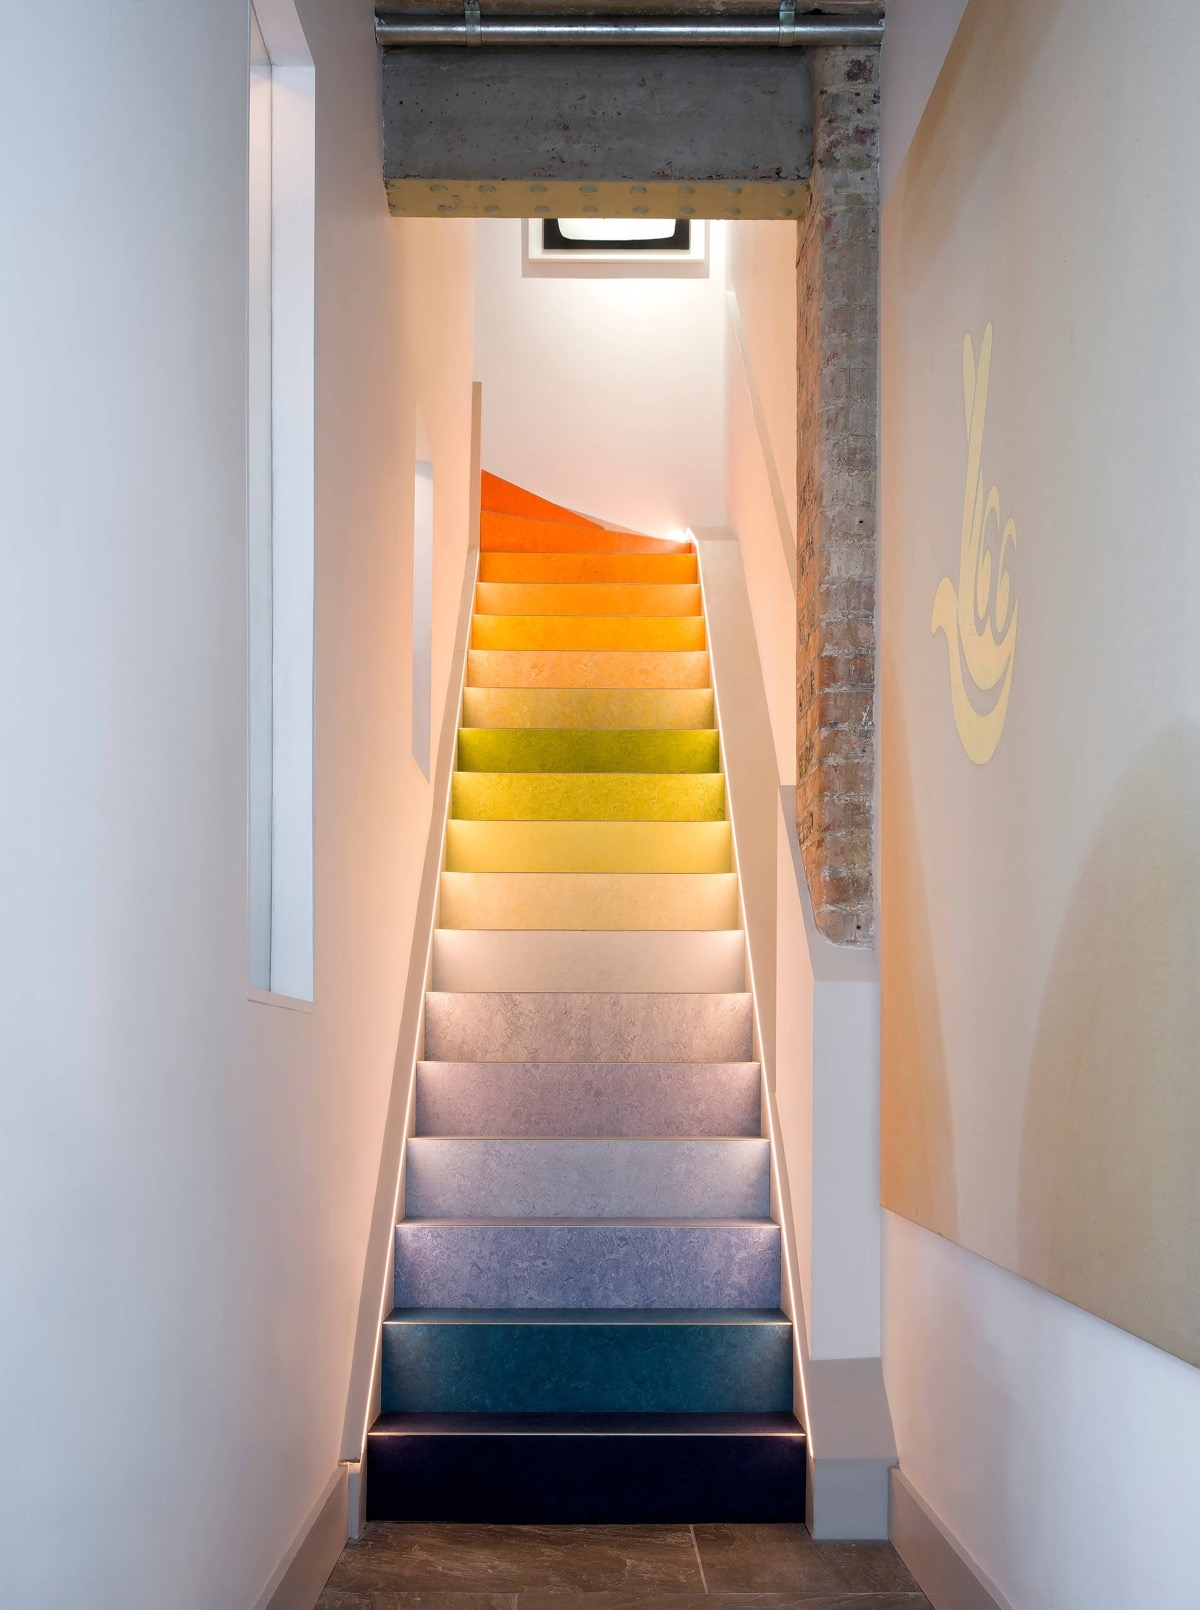 51 Stunning Staircase Design Ideas | Stairs Side Wall Design | Modern | Stone | Pop | Wallpaper | Stair Pattern